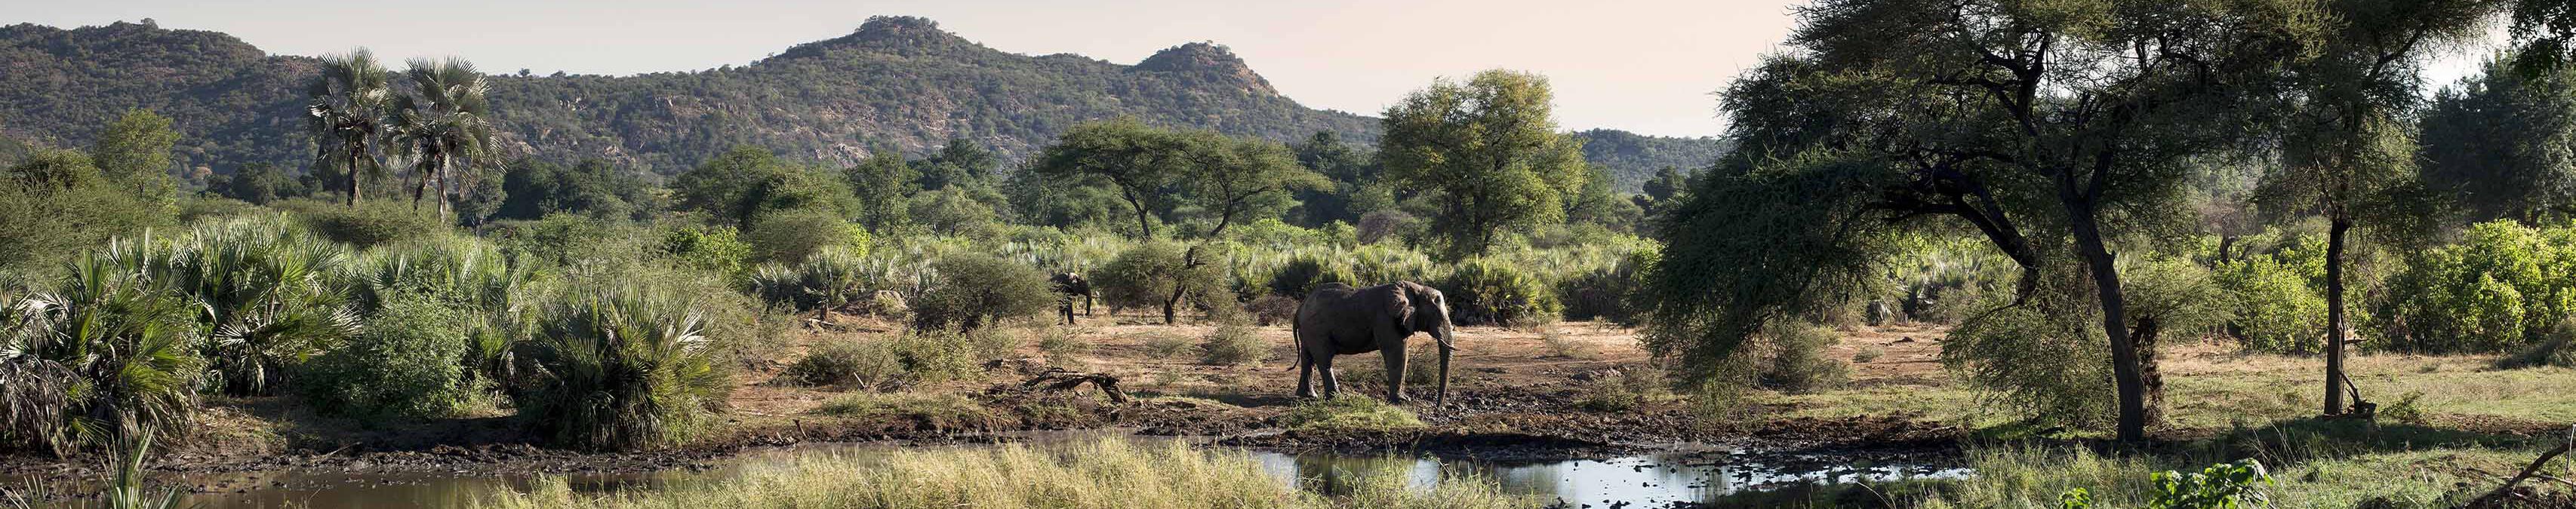 Silence of the Elephants